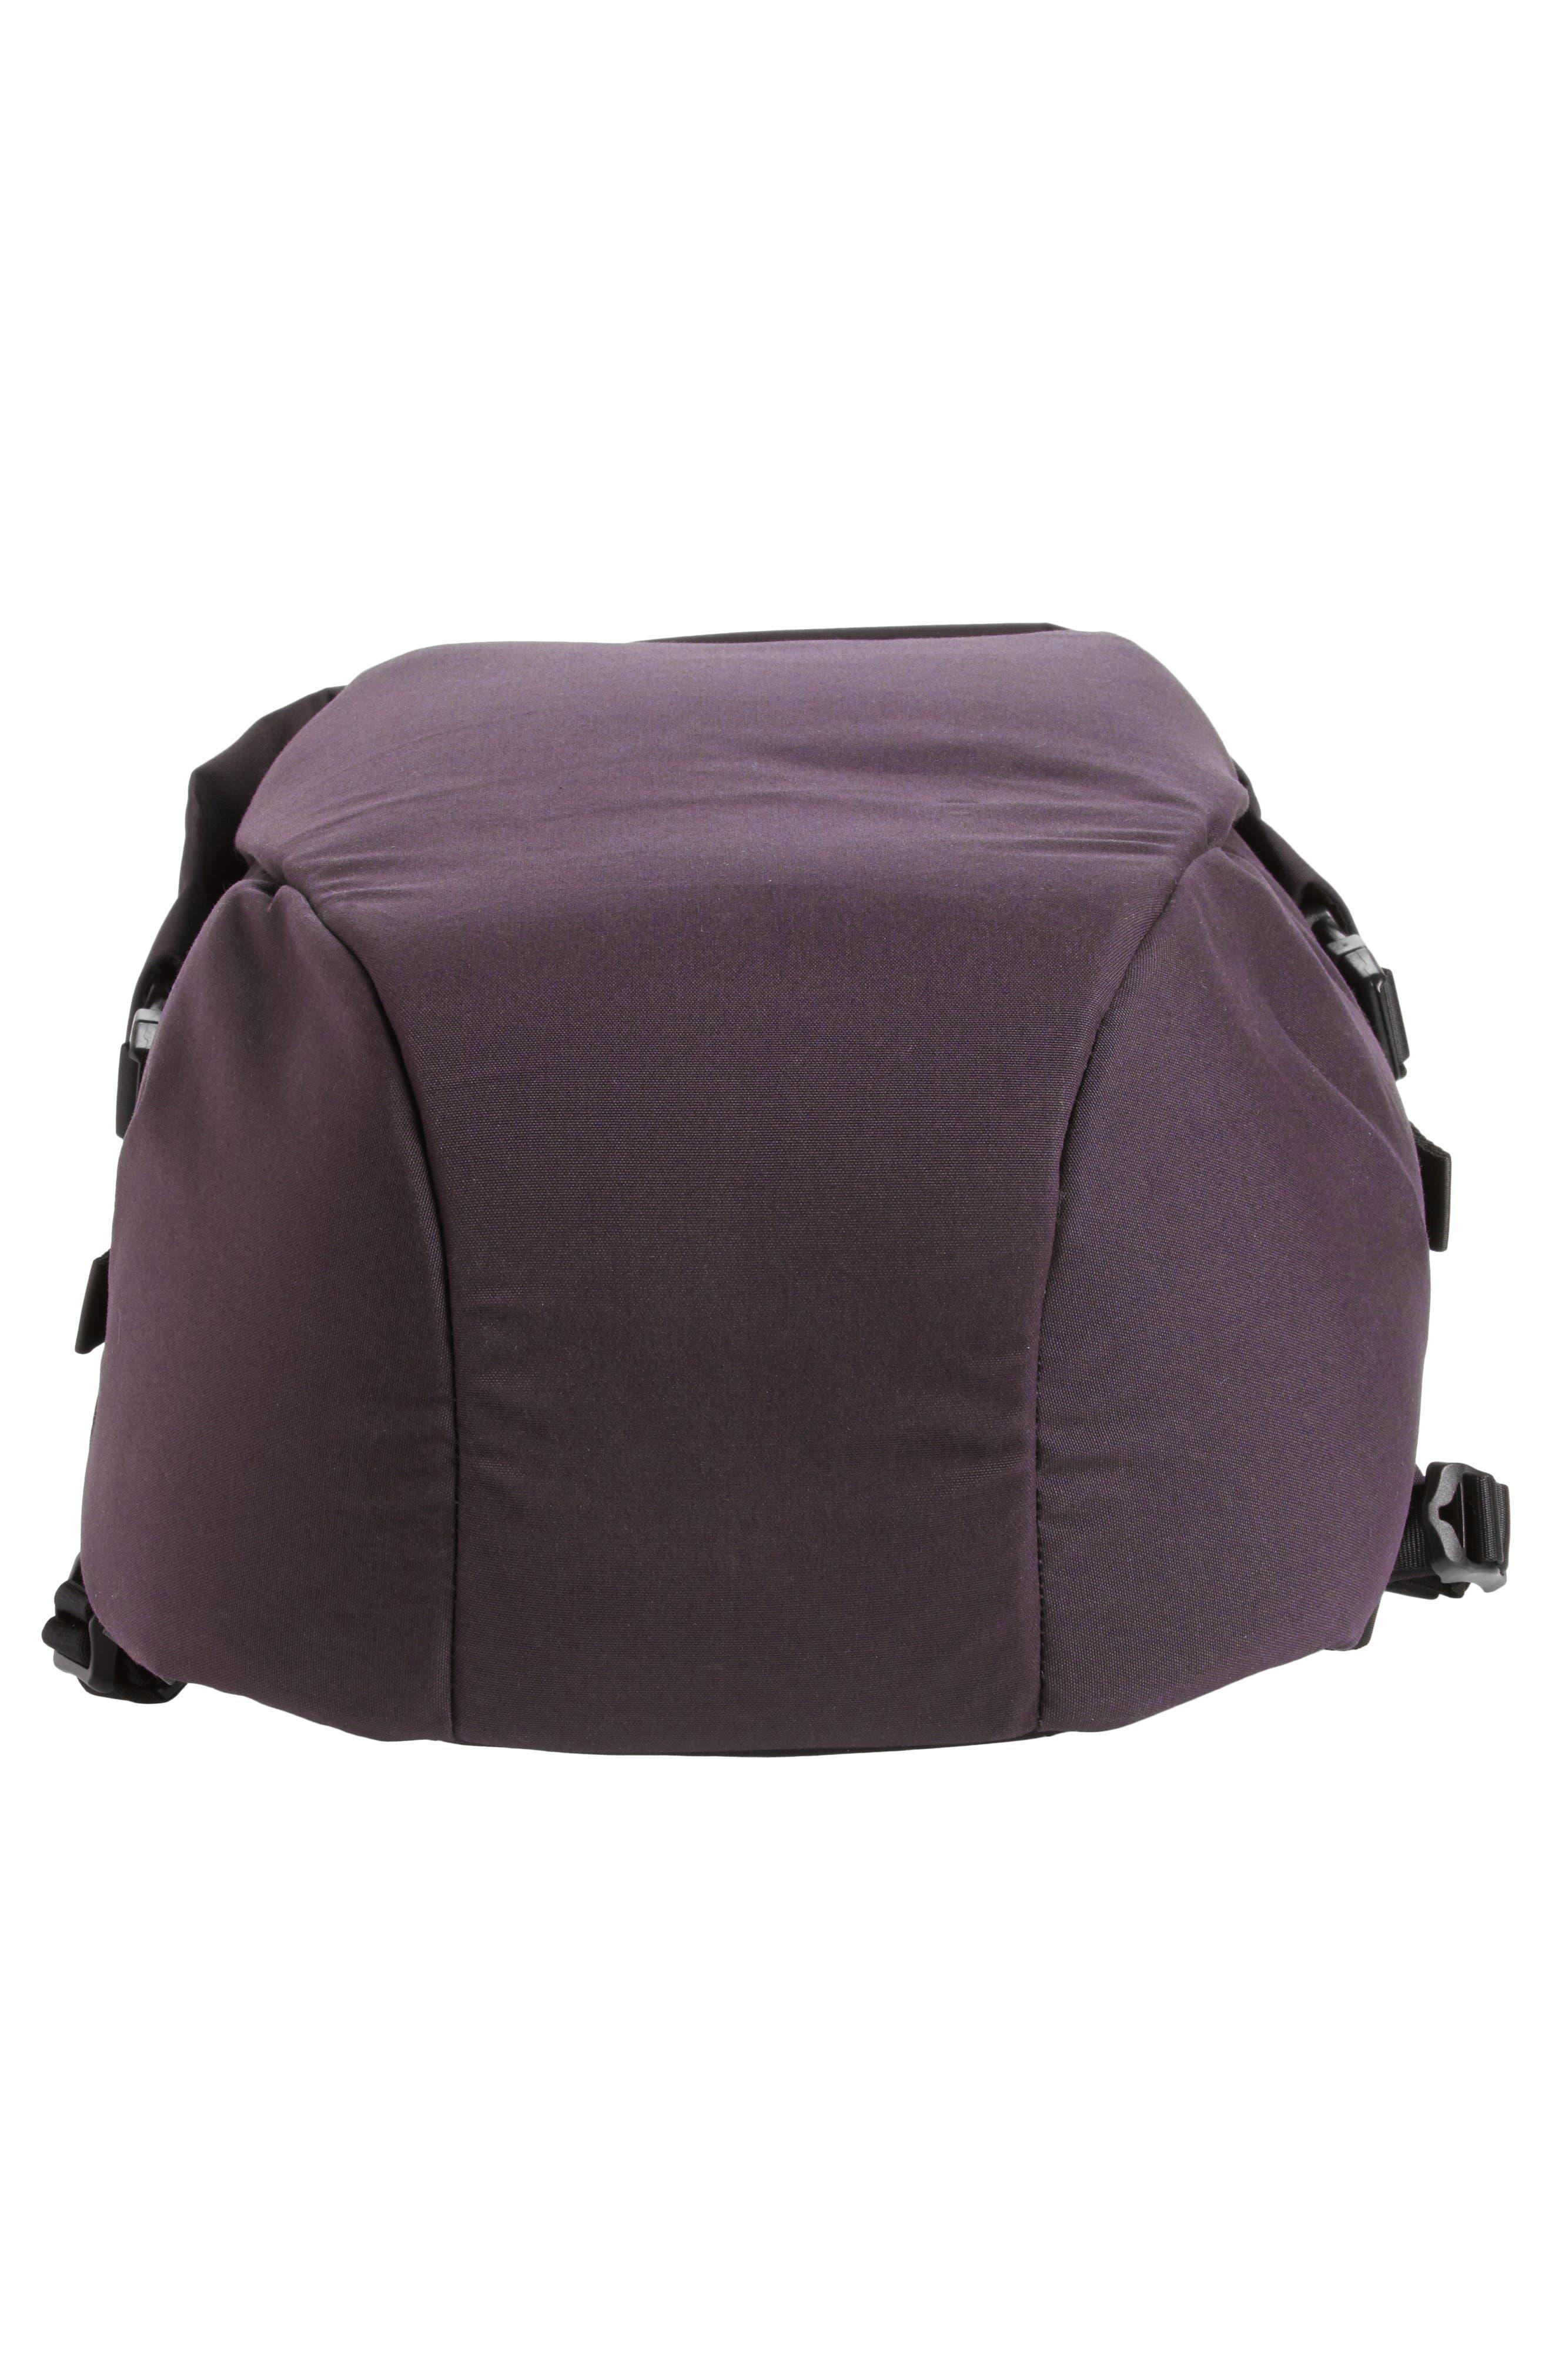 Locker Pack Lux Backpack,                             Alternate thumbnail 6, color,                             Port